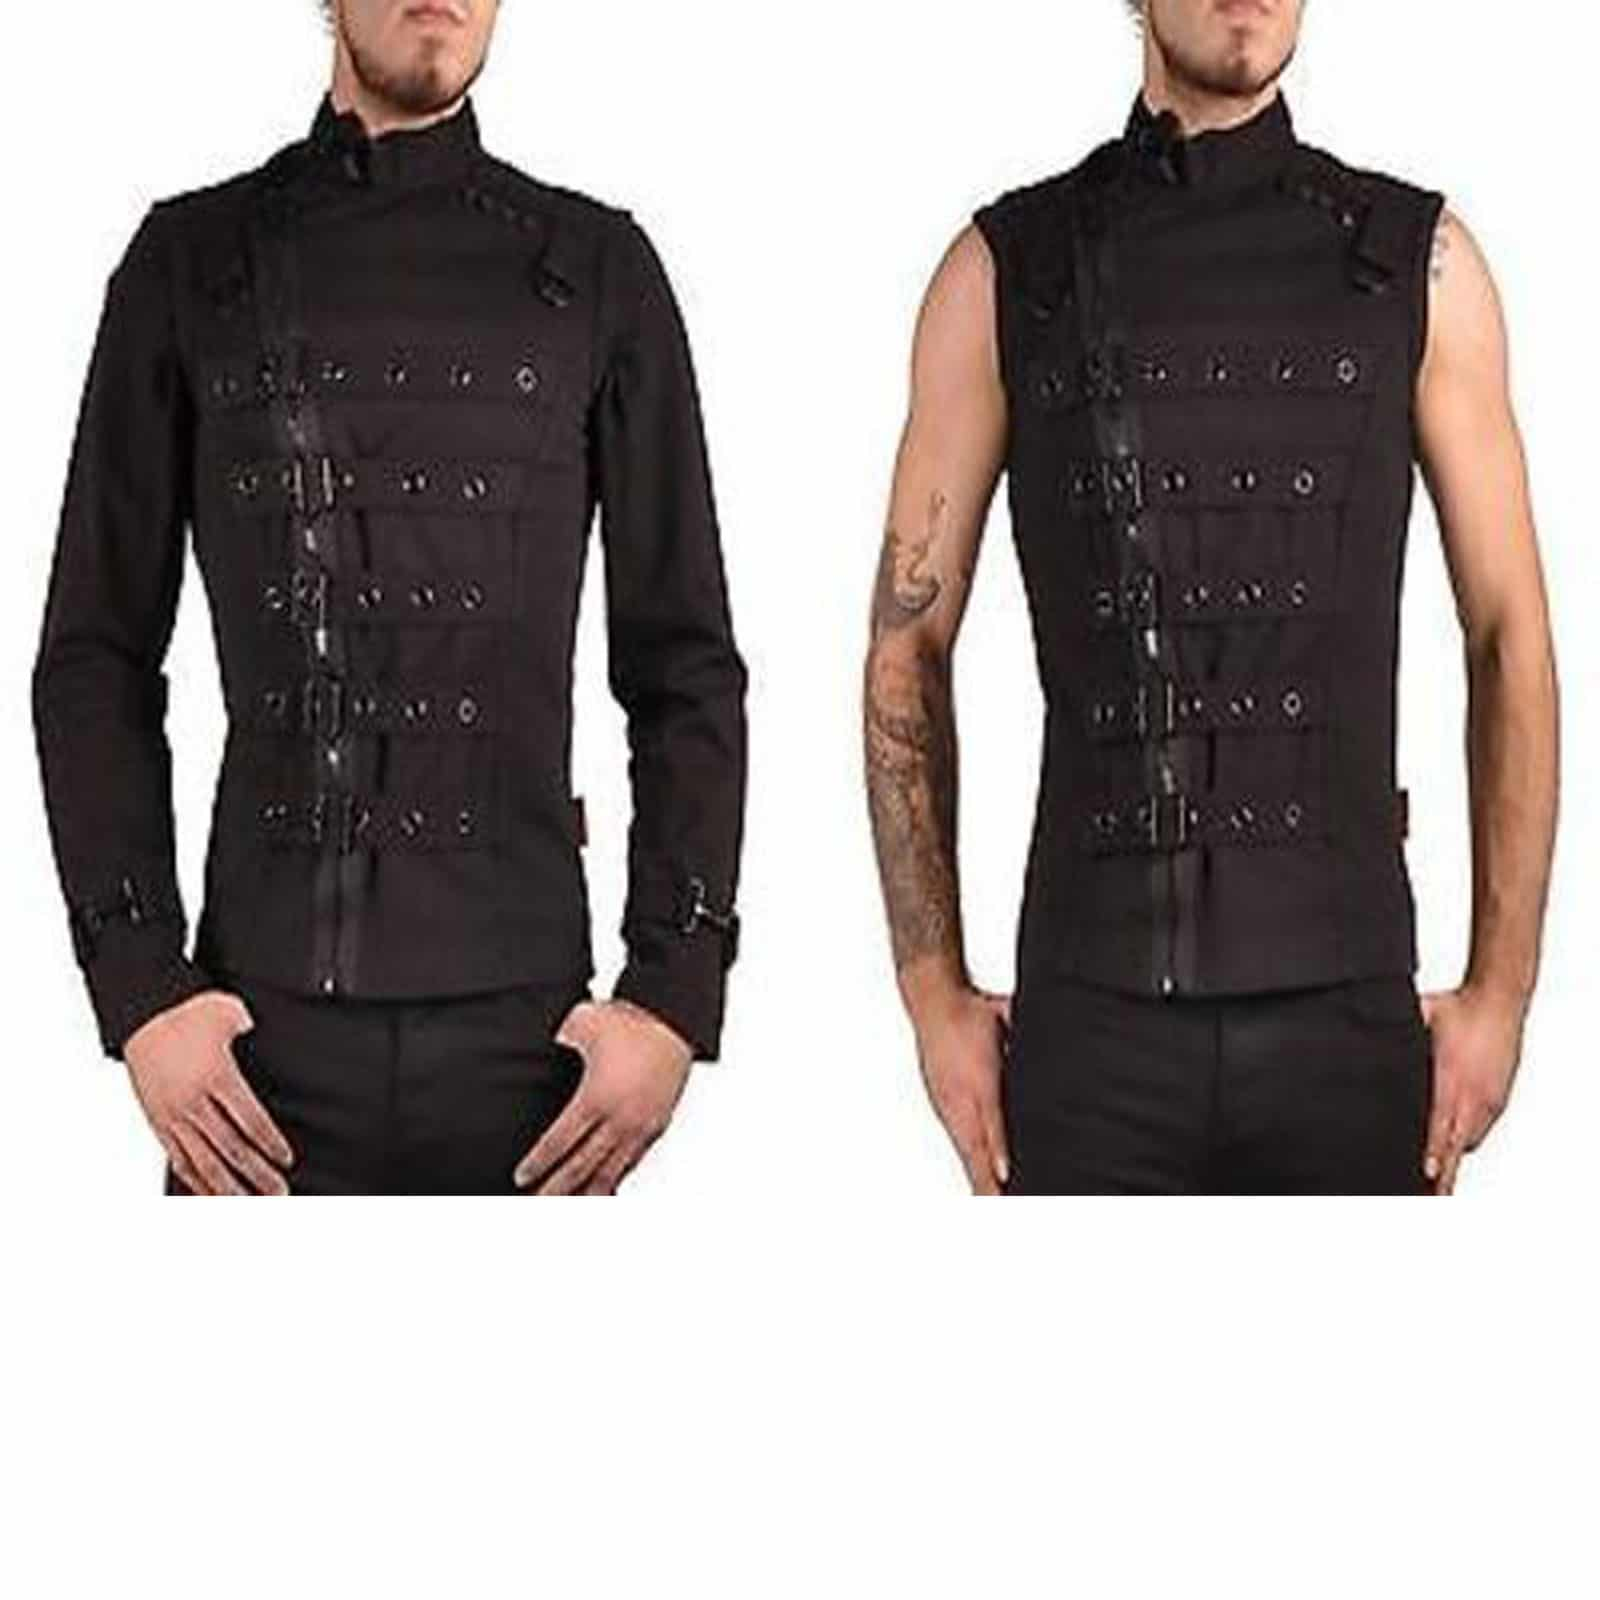 Bondo Bondage Emo Cyber Goth Metal Punk Jacket Custom